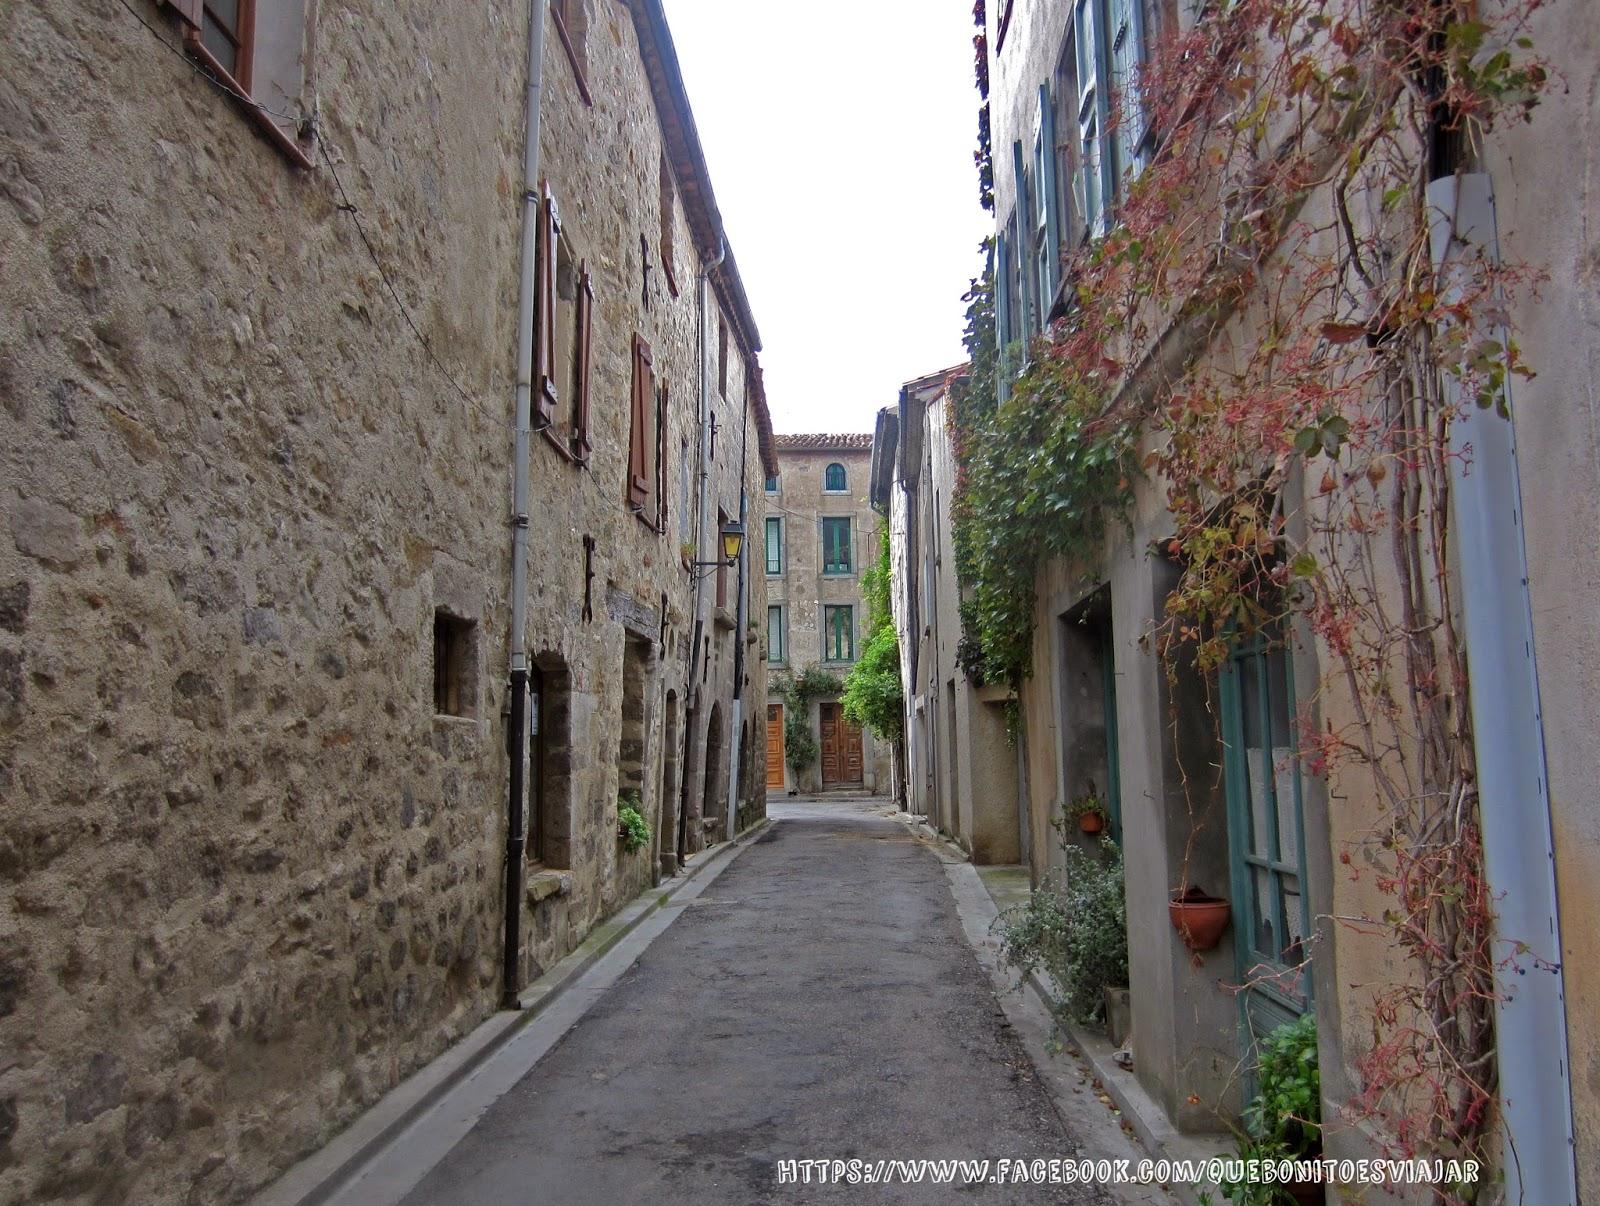 Calle de Lagrasse